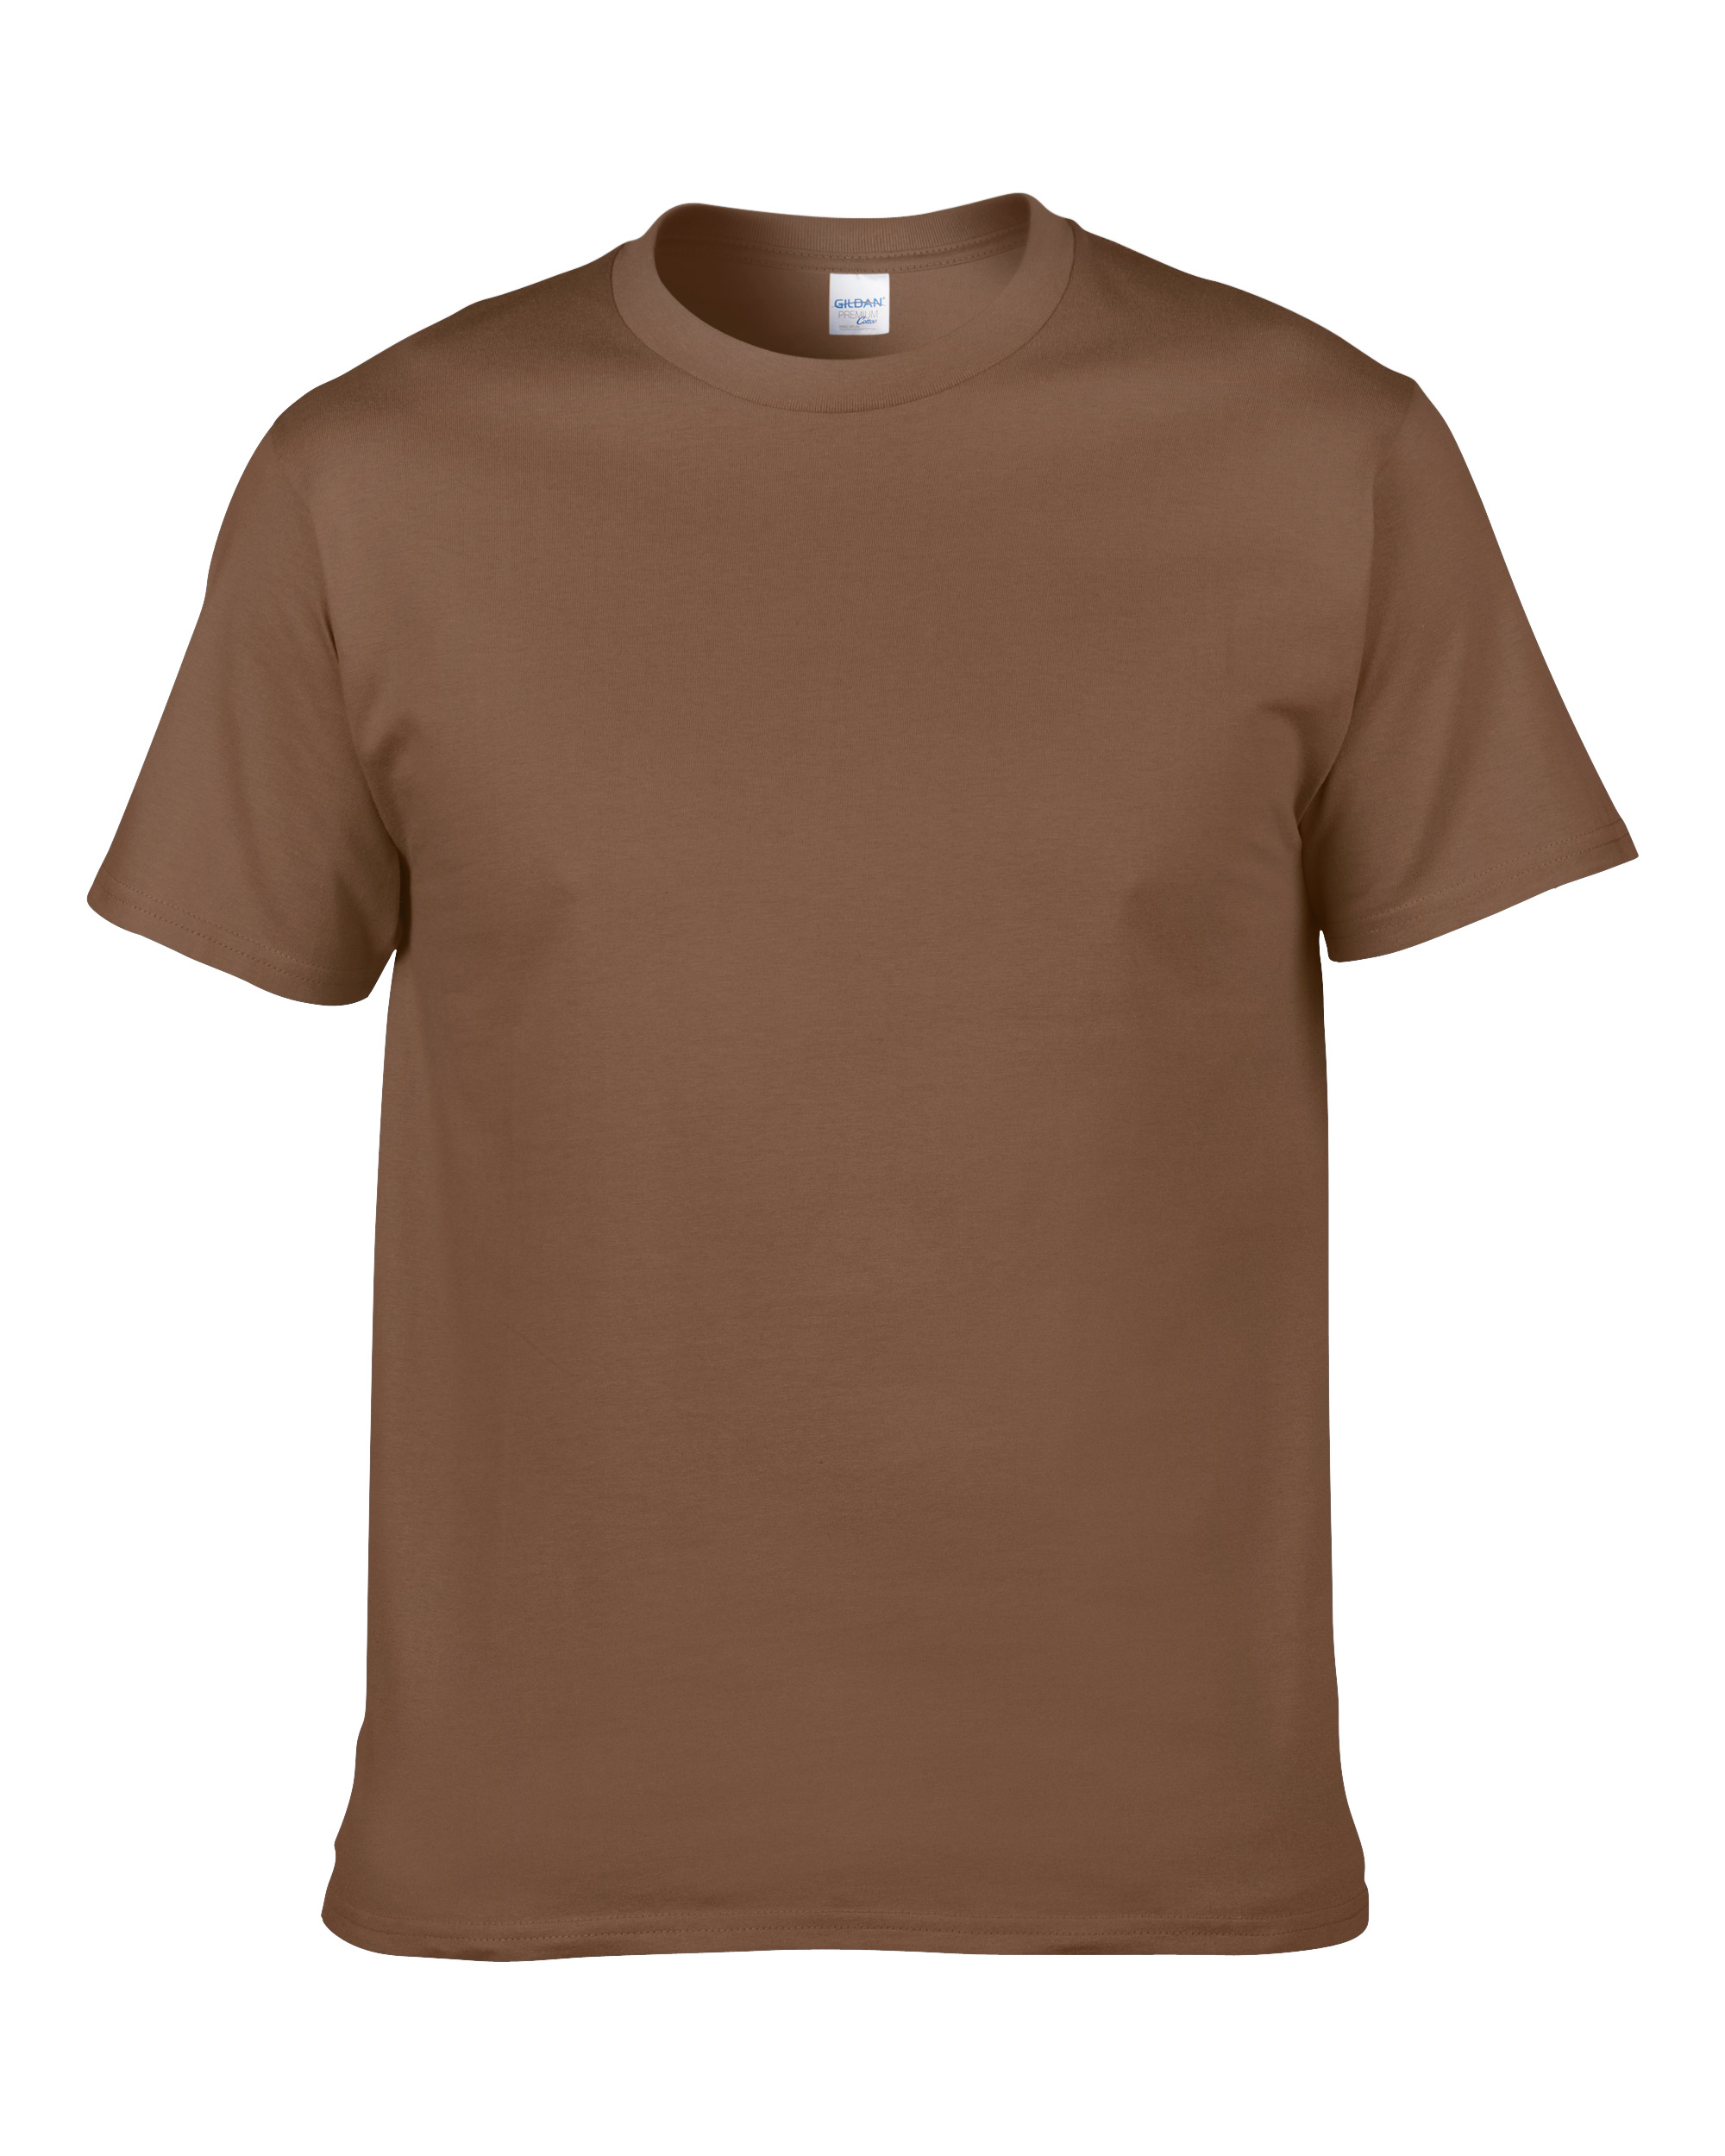 T shirt design kuala lumpur -  Gildan 76000 Premium Cotton T Shirt Chestnut 3 Celebratee No 1